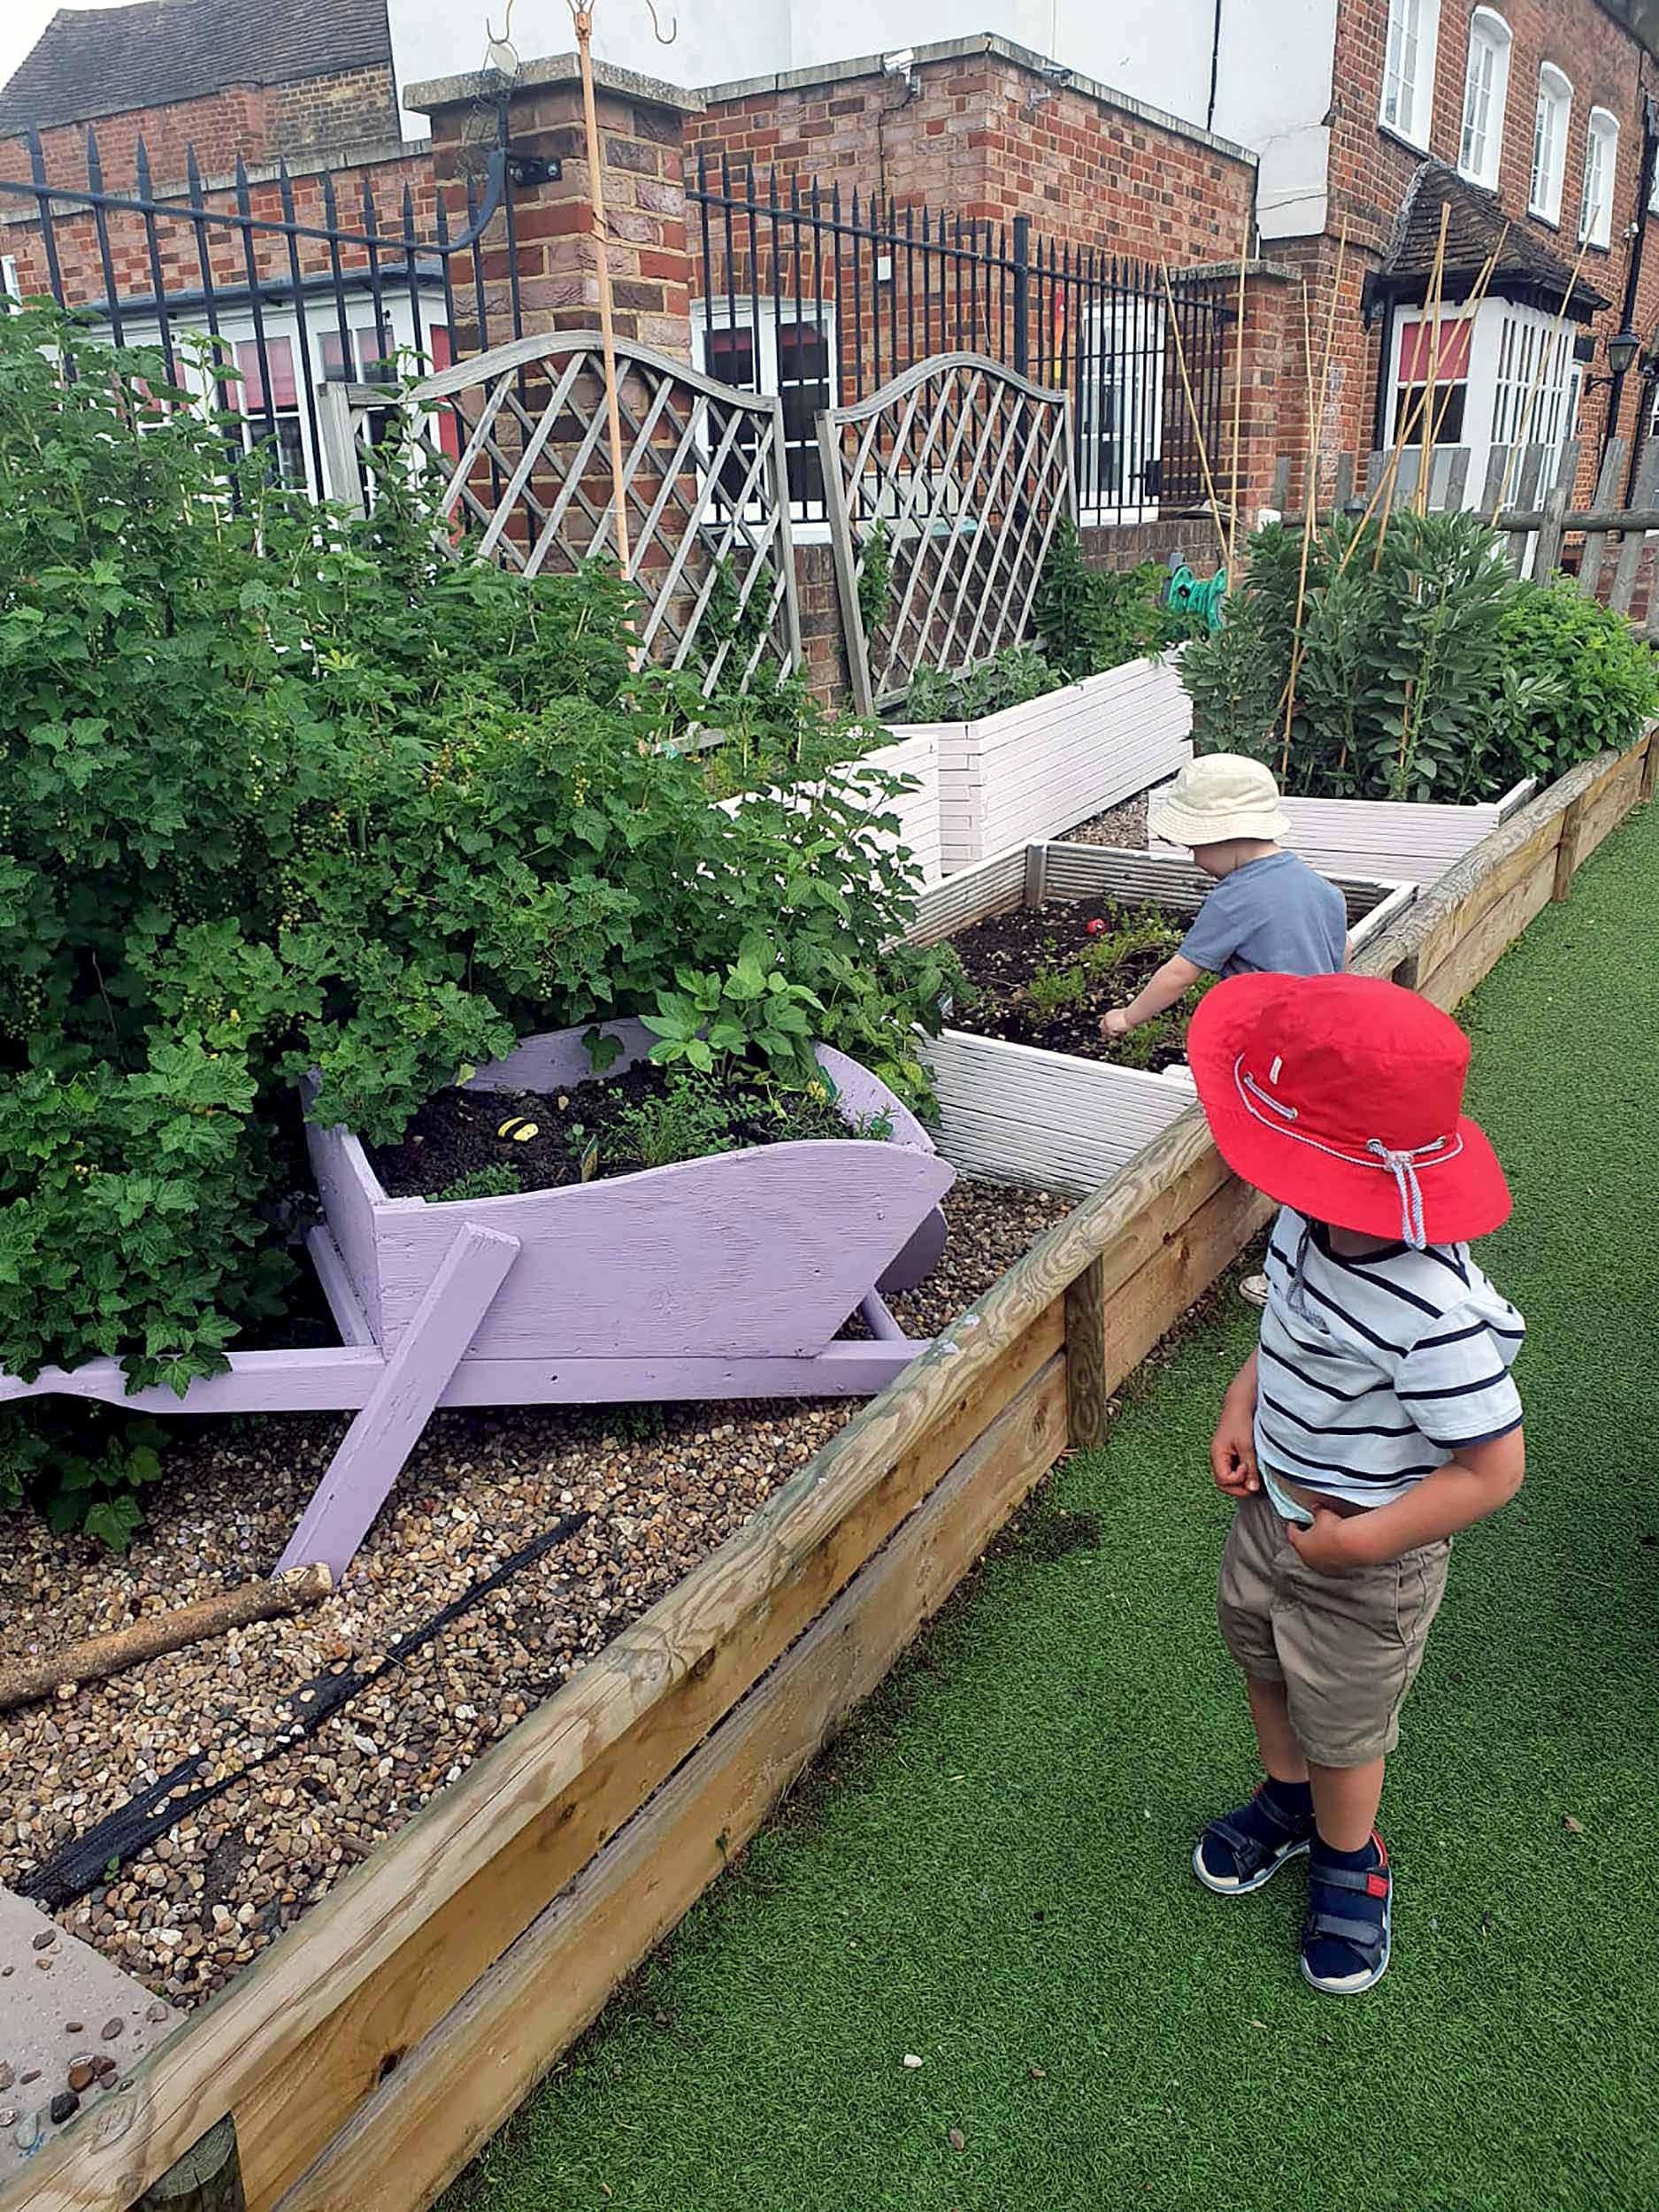 Grow your own at Nursery